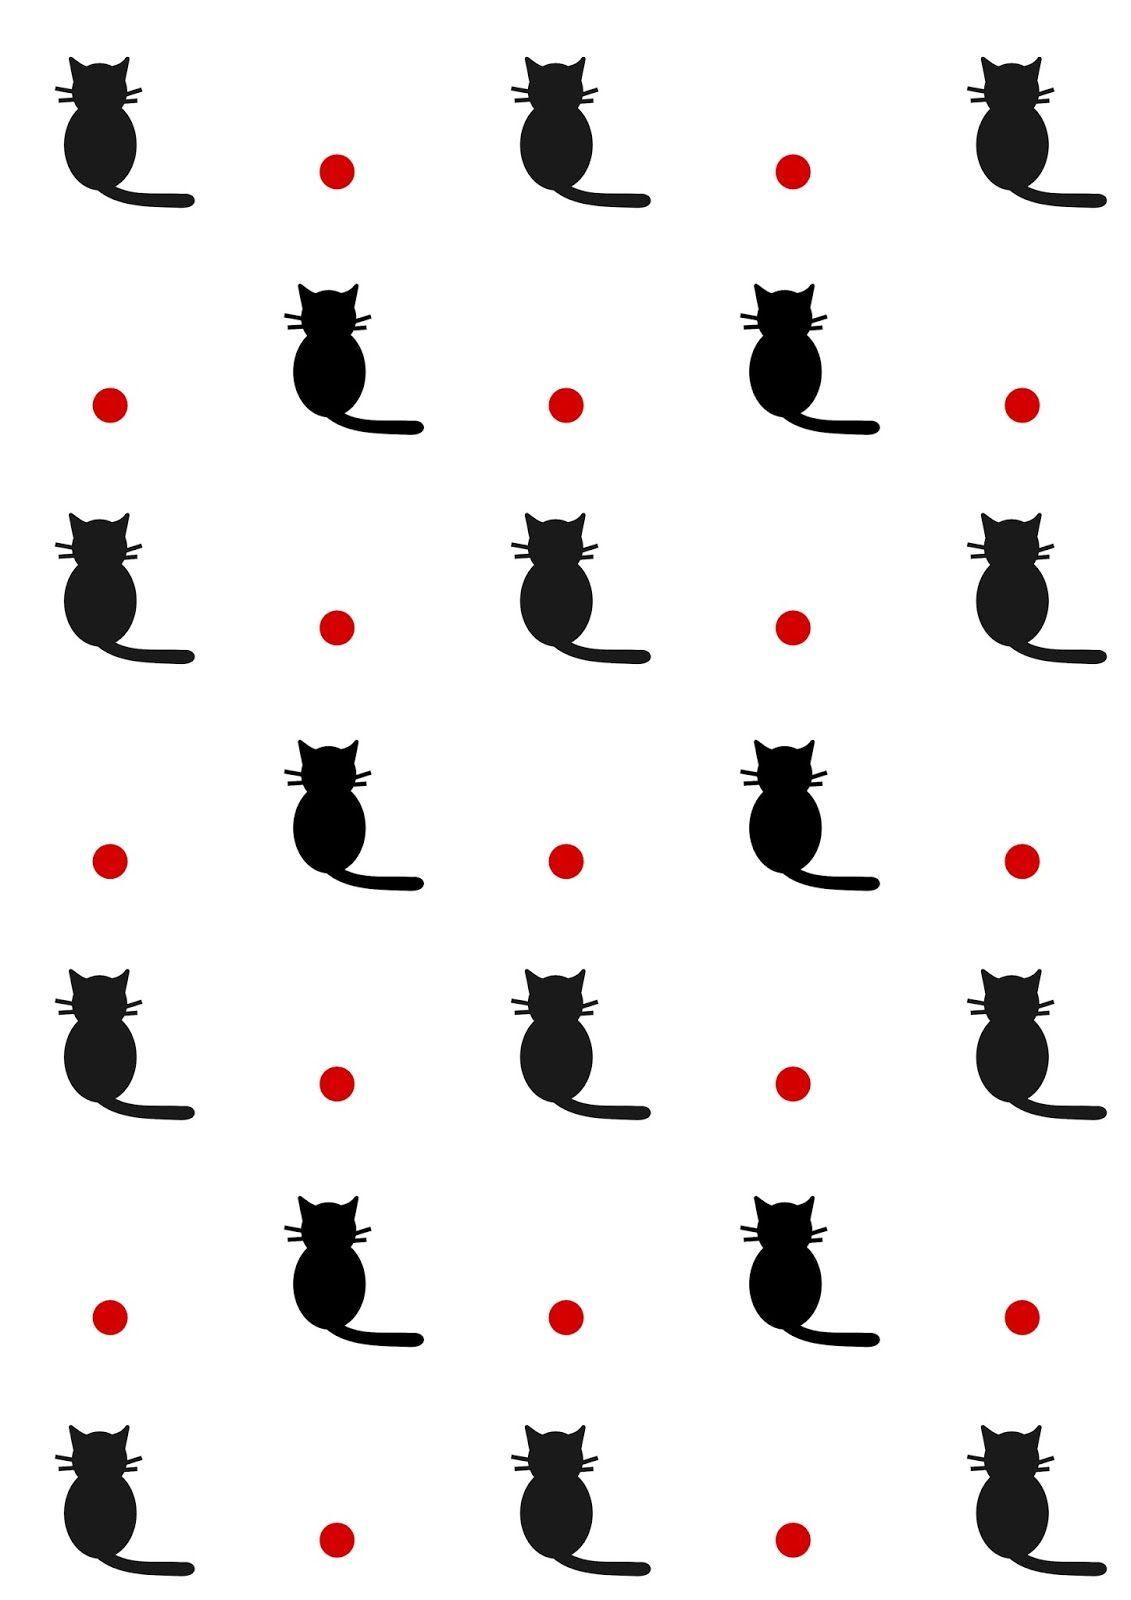 Free digital cat scrapbooking paper - ausdruckbares Geschenkpapier ...